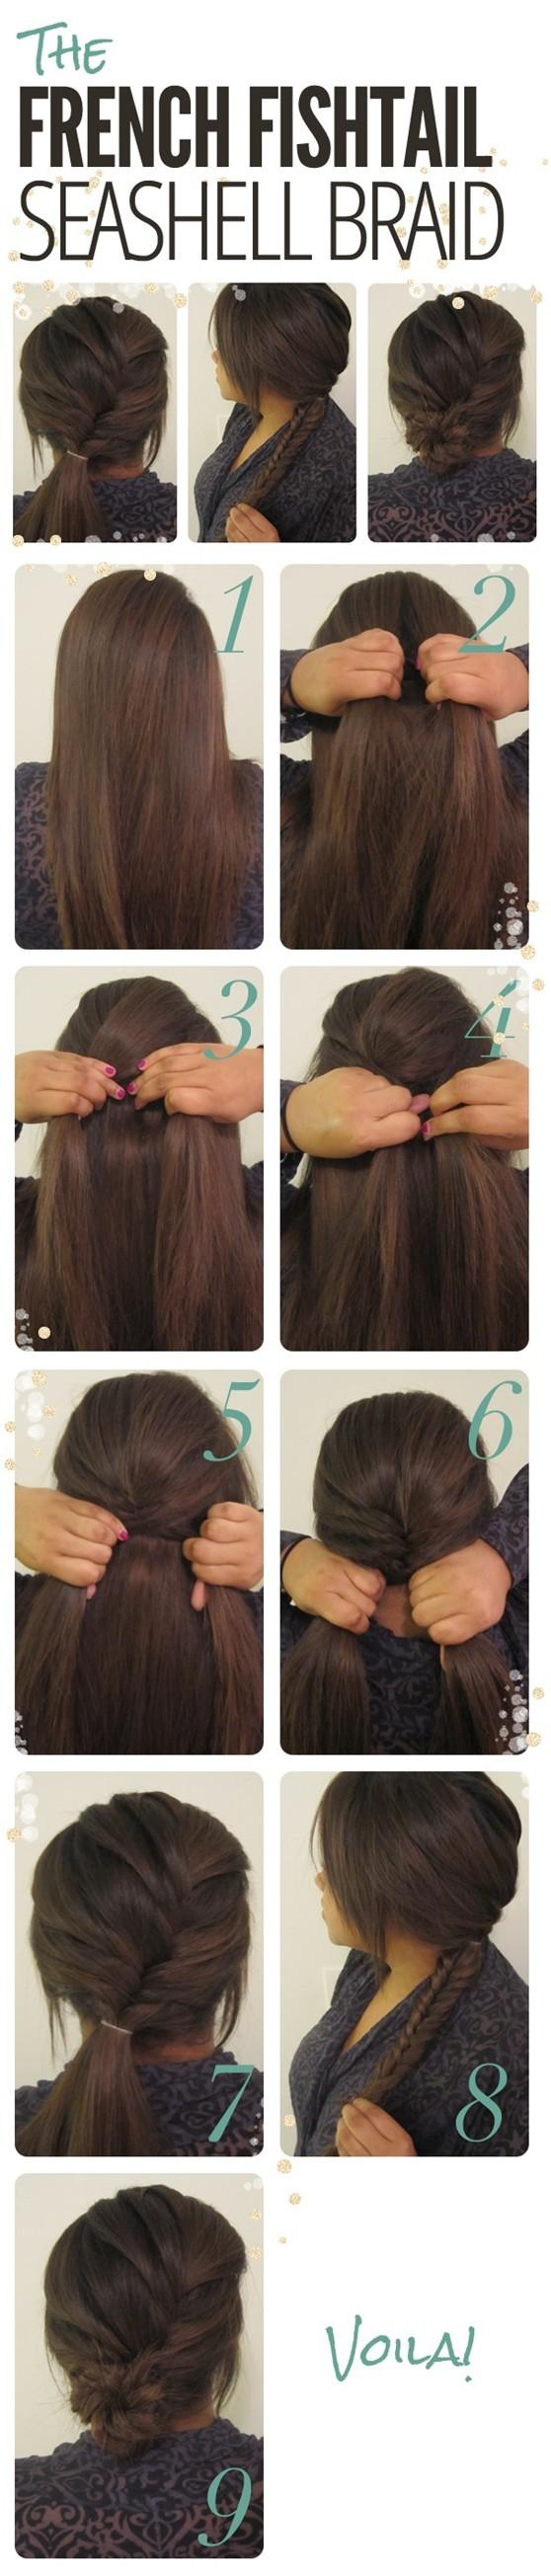 Braided Updo Hairstyles Tutorials: French fishtail seashell braid